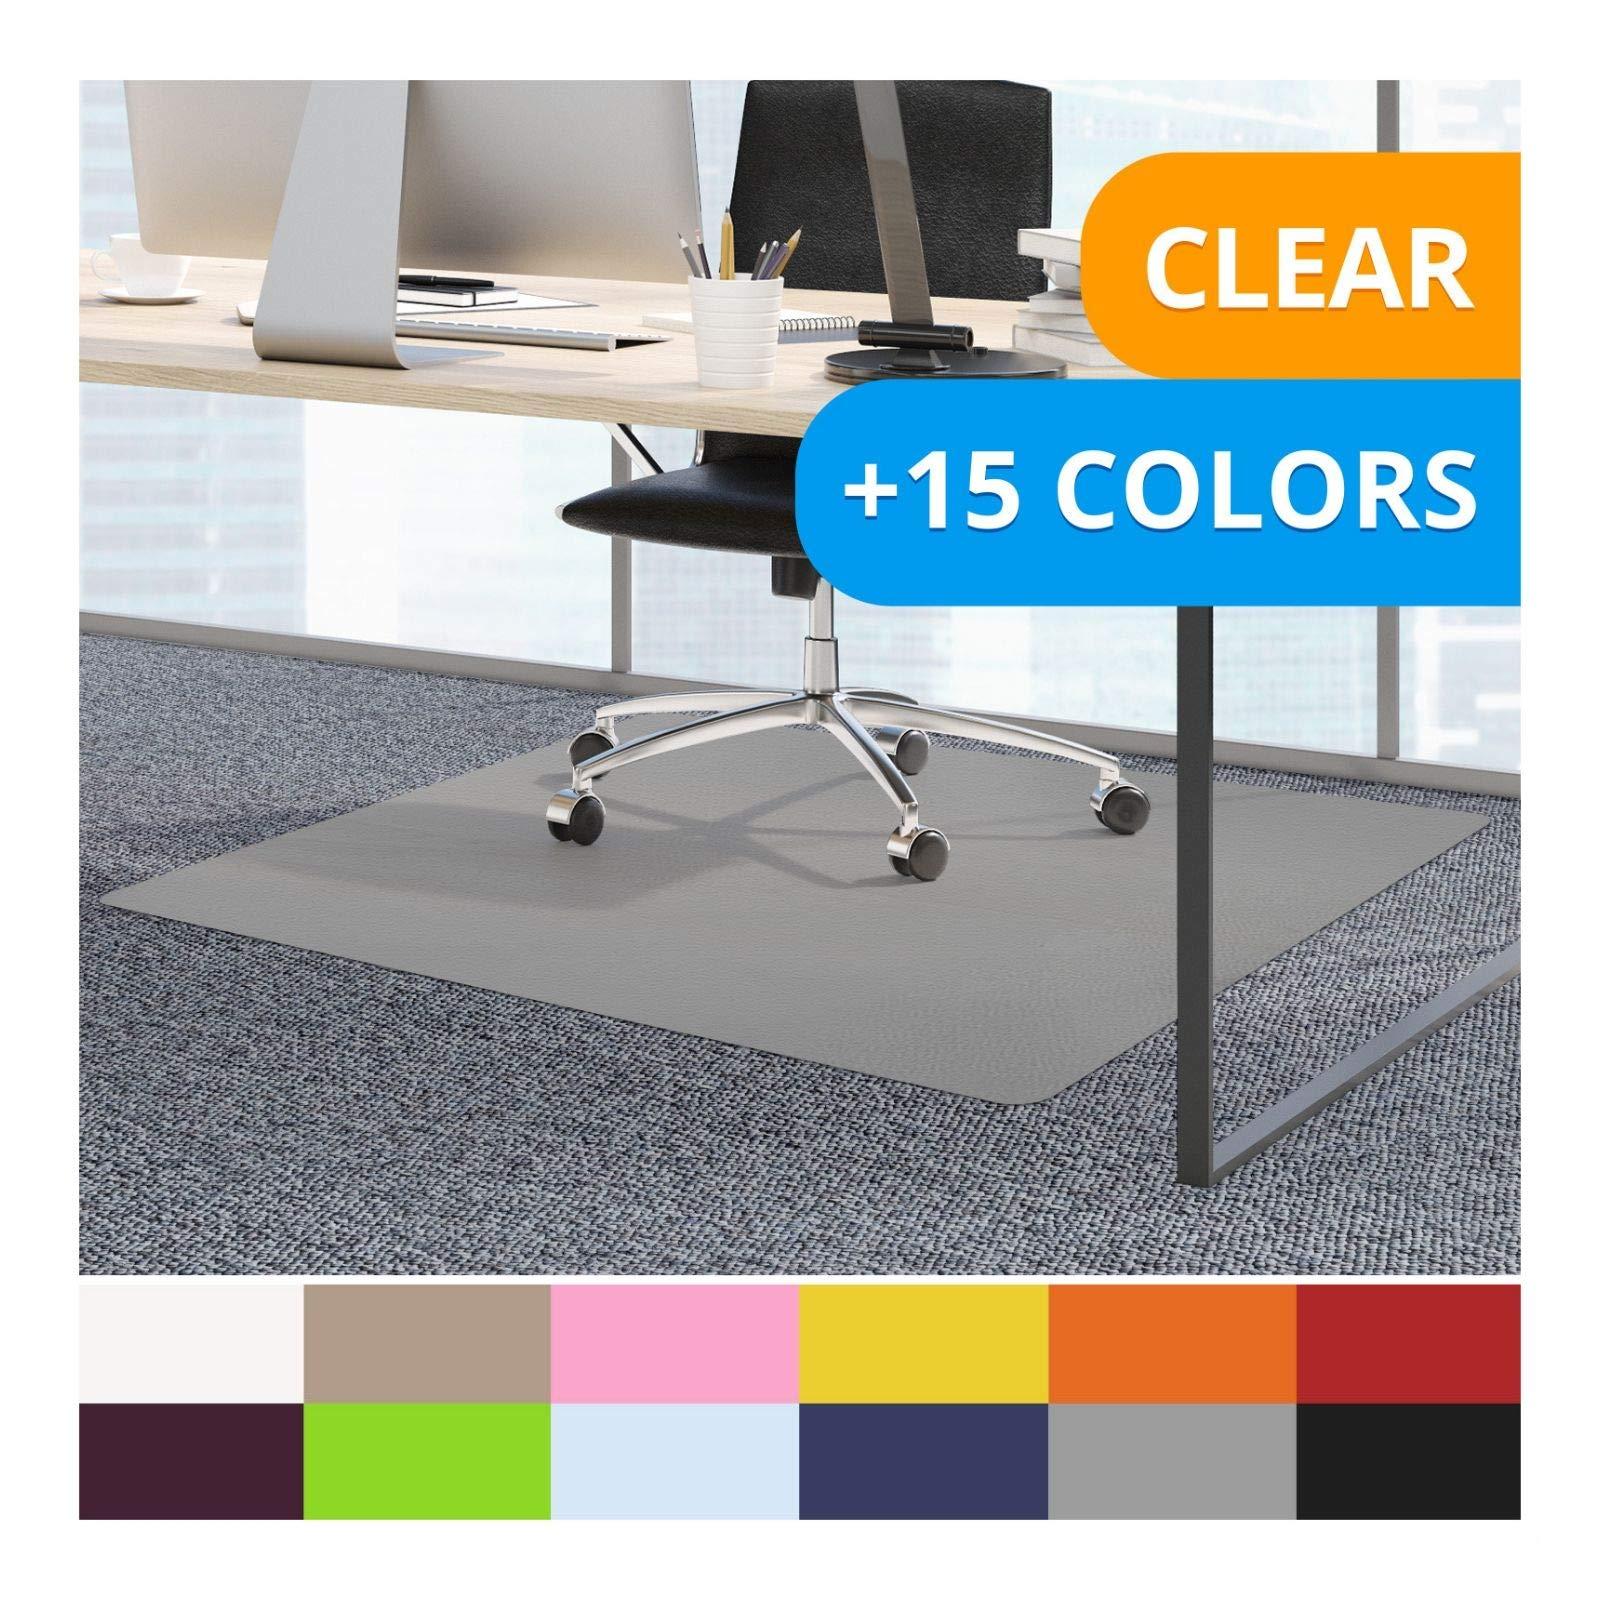 casa pura Office Chair Mats for Carpeted Floors - 48''x60'' | Carpet Protector Floor Mat, Grey - BPA Free, Odorless | Matching Desk Mats Available